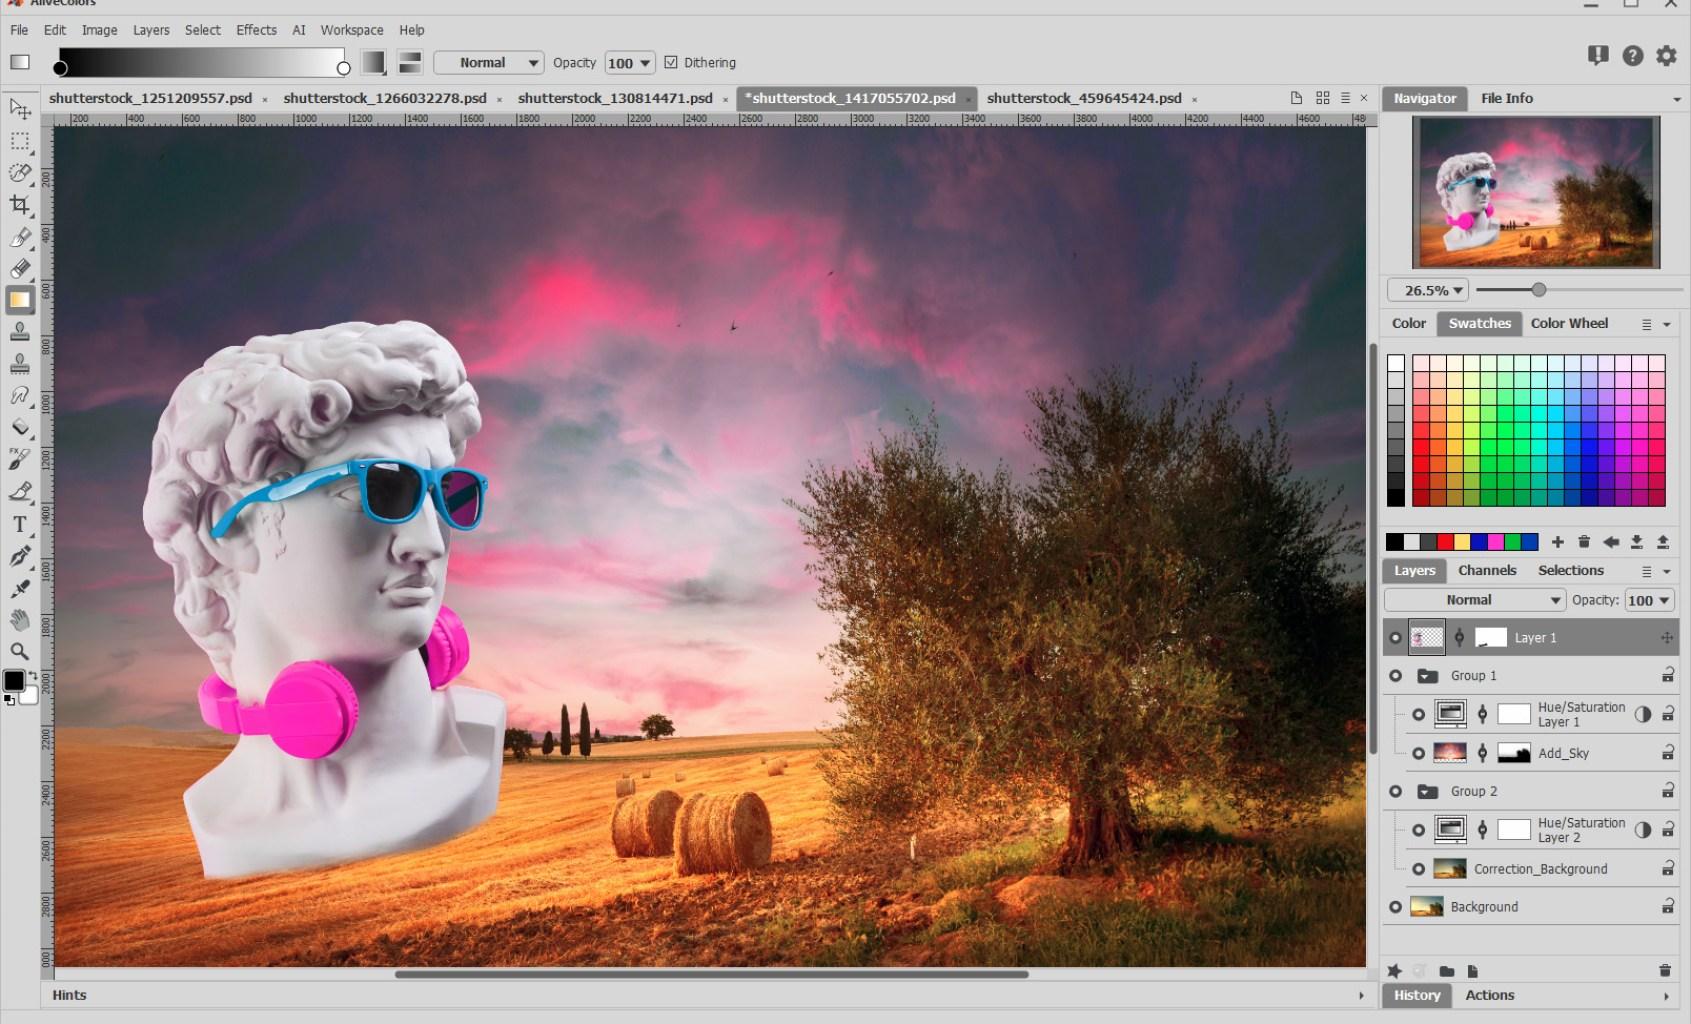 AliveColors for Mac 1.2.1560.16140 破解版 - 图片编辑软件